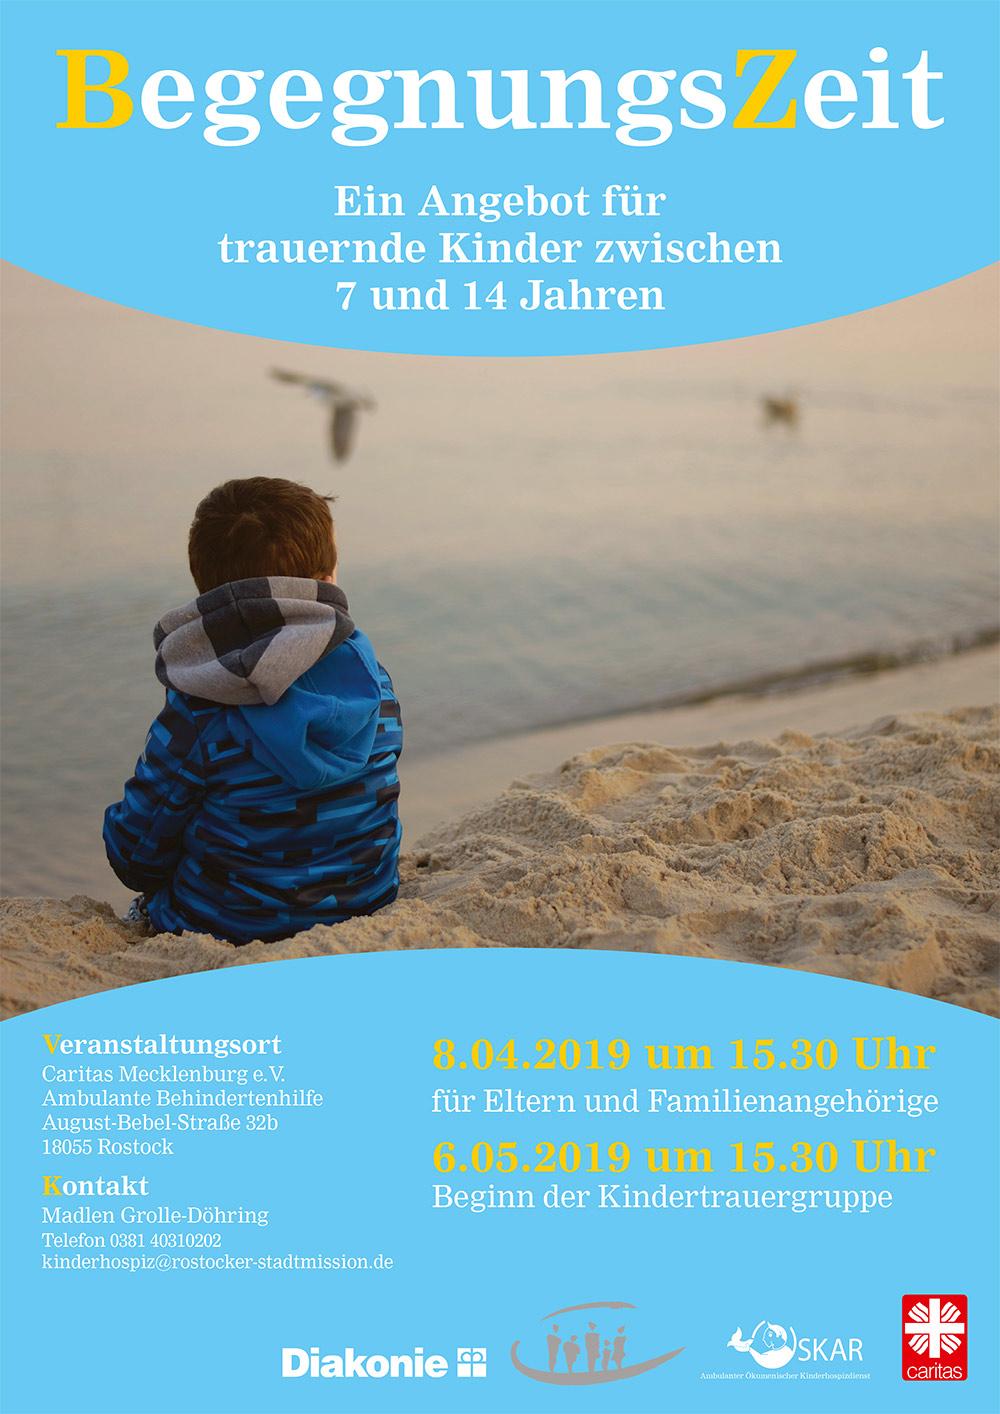 BegegnungsZeit Kindertrauergruppe @ Caritas Mecklenburg e.V. Ambulante Behindertenhilfe